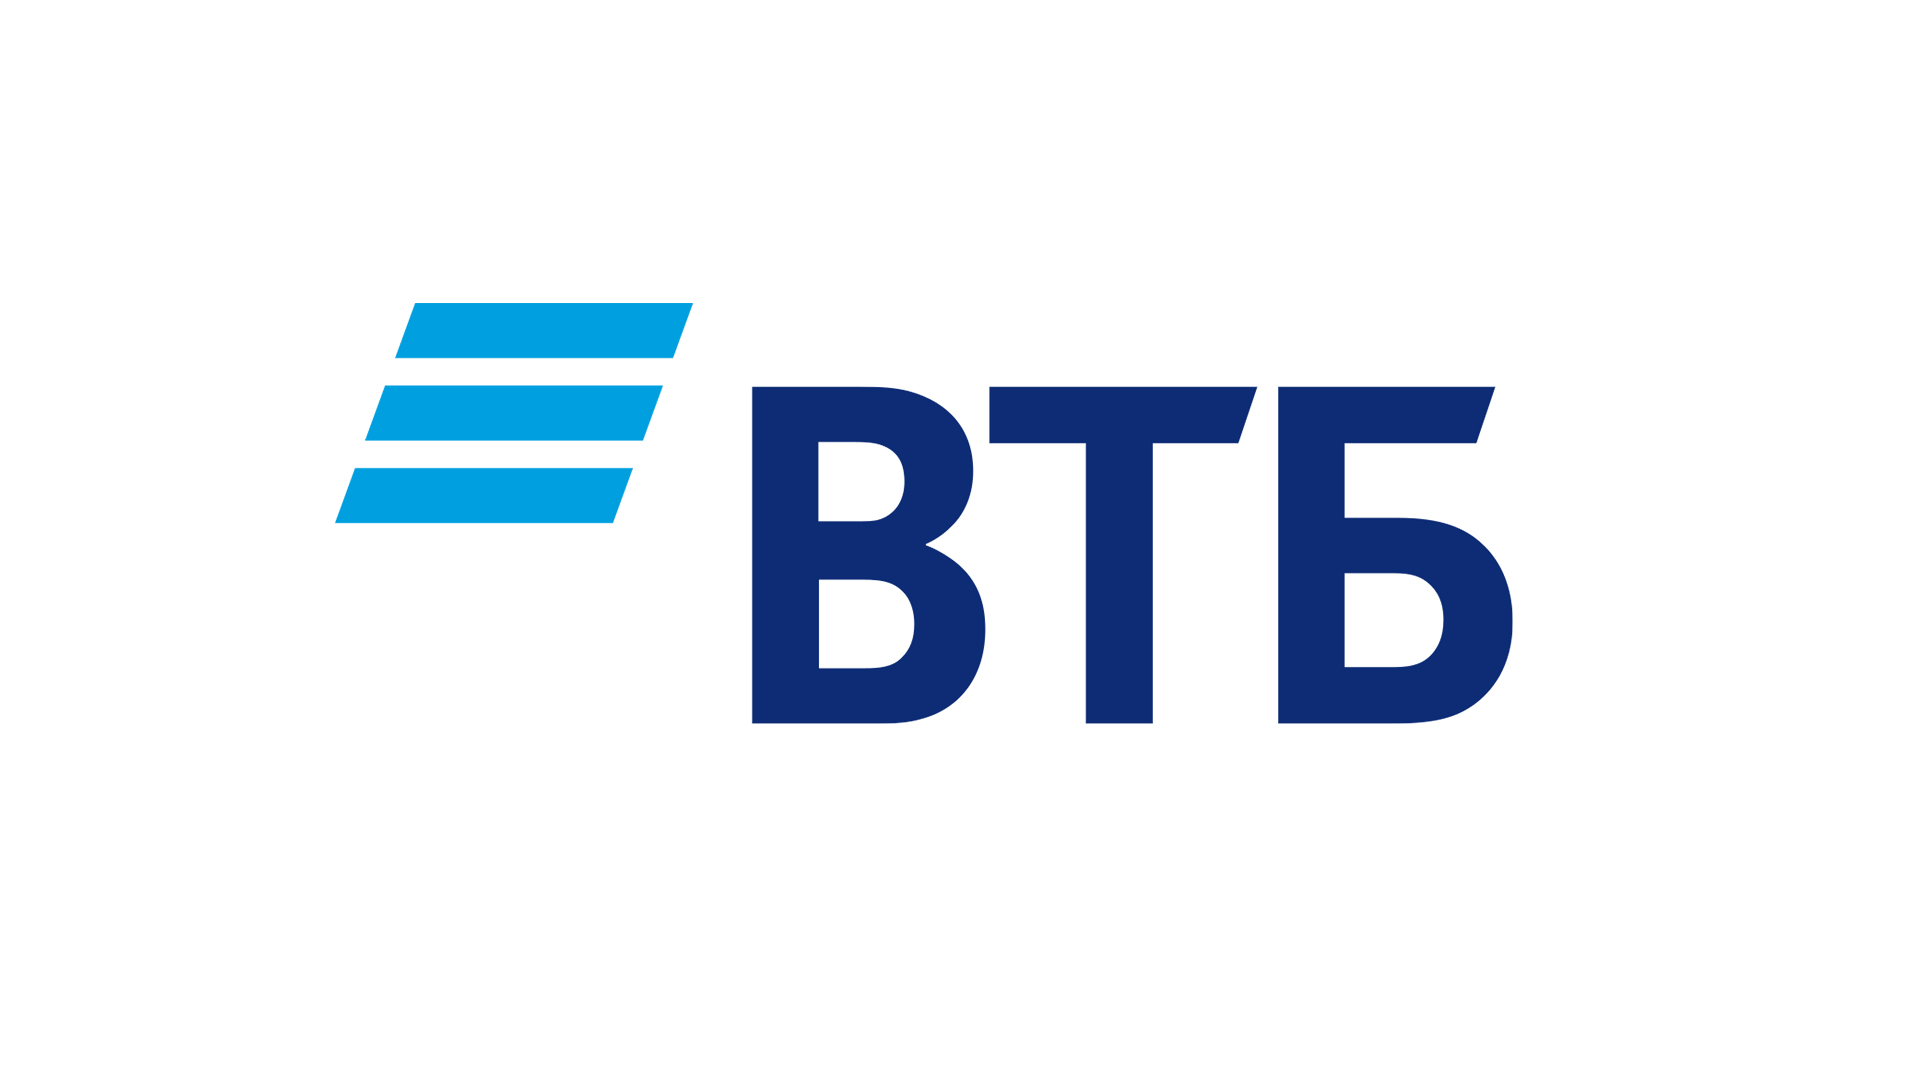 ВТБ: жители СКФО сократили покупки за рубежом на треть